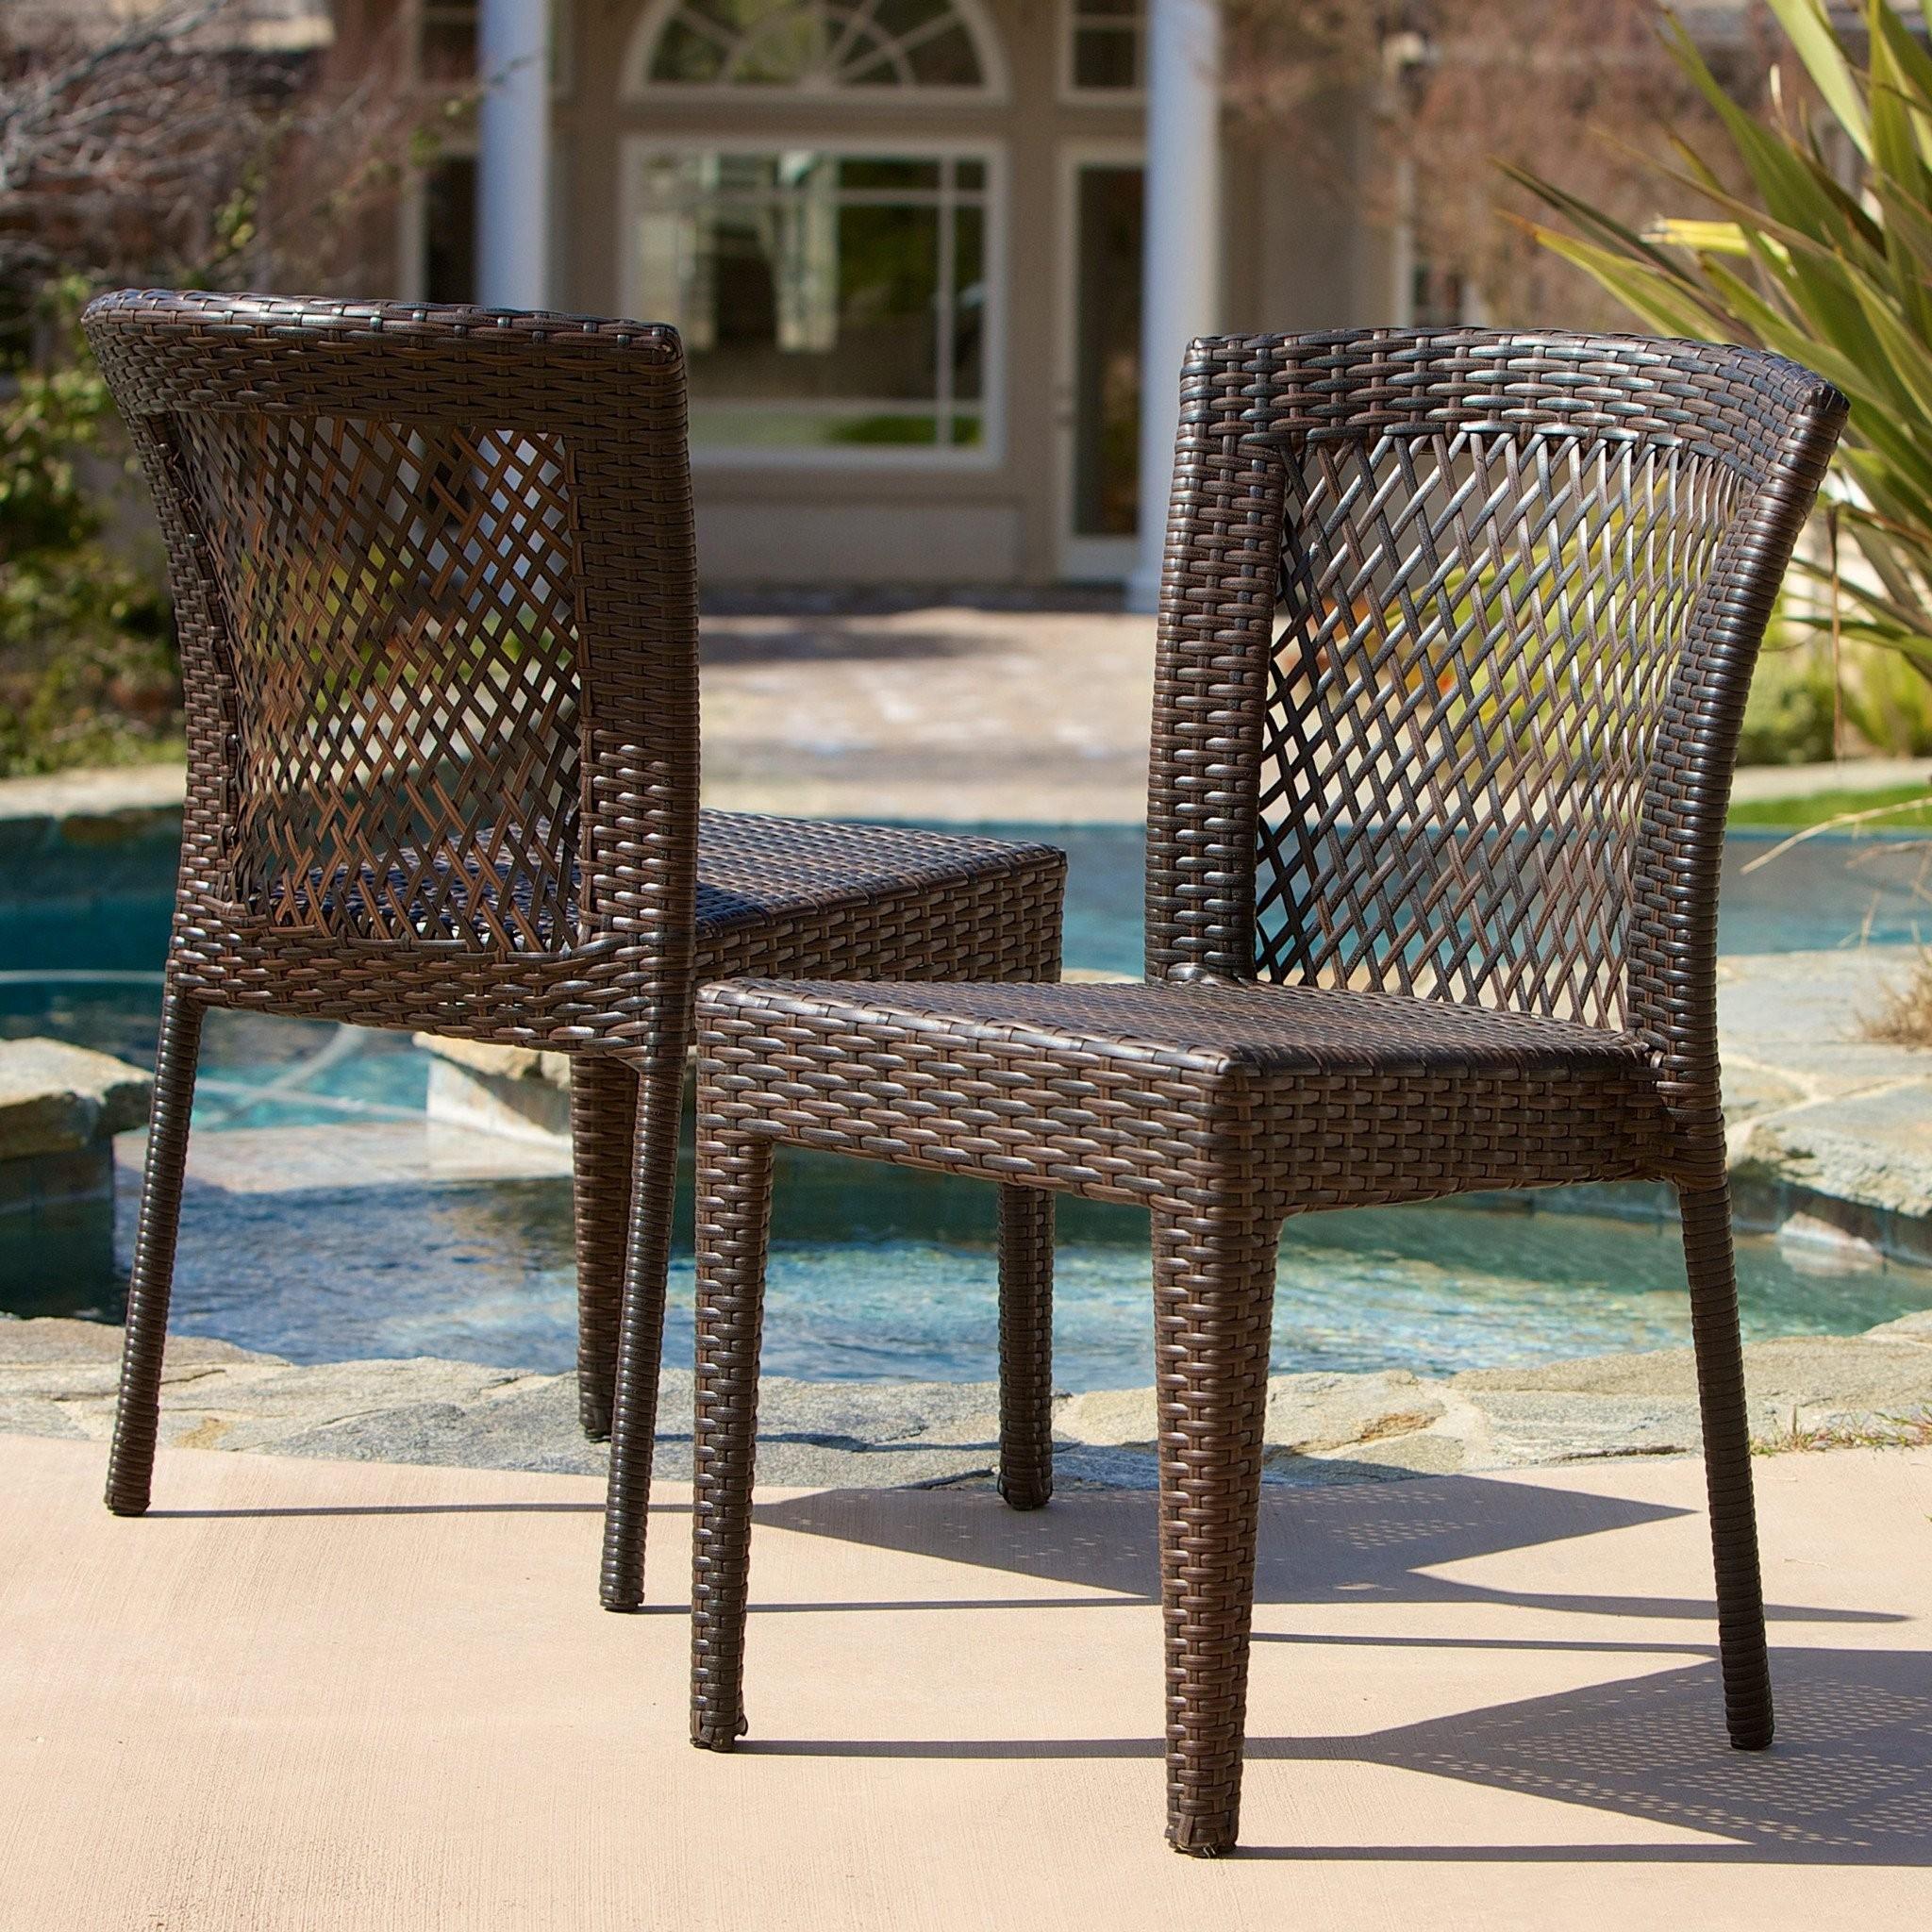 Dana Point Outdoor Patio Furniture Brown Wicker Ch...